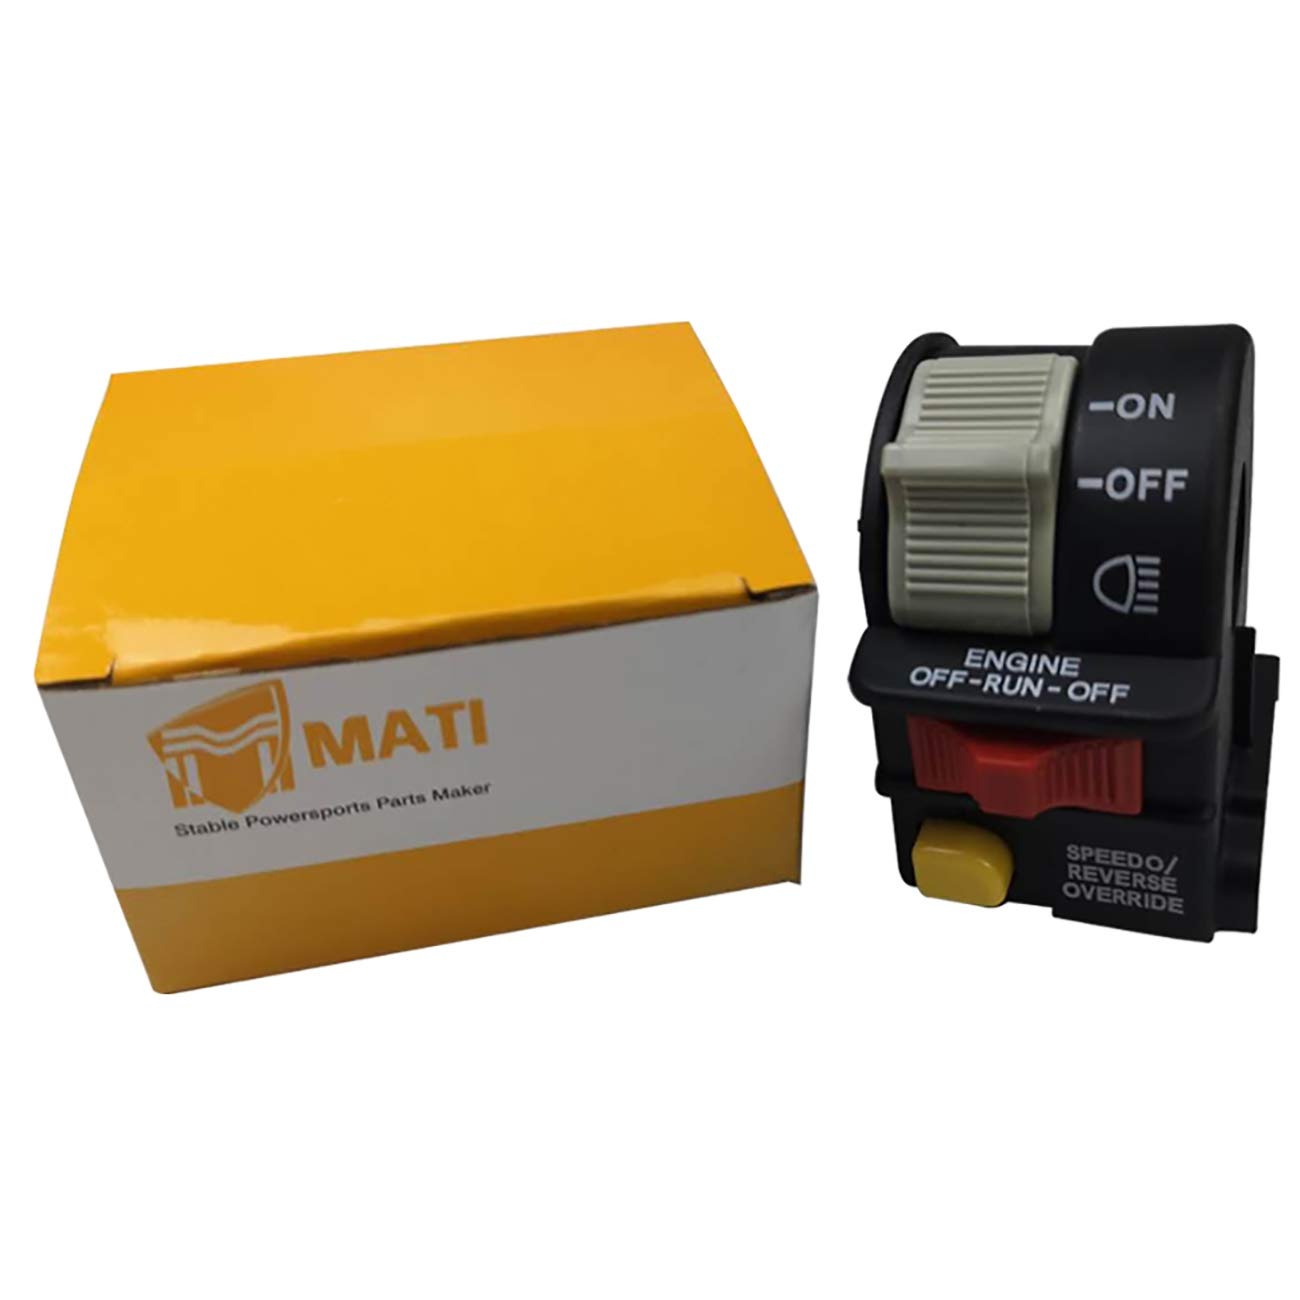 Mati 4011655 4011516 Left Handlebar Headlight On Off Switch Assembly for Polaris Hawkeye 300 Scrambler 500 Sportsman 300 400 850 XP 1000 Trail Blazer 330 Trail Boss 330